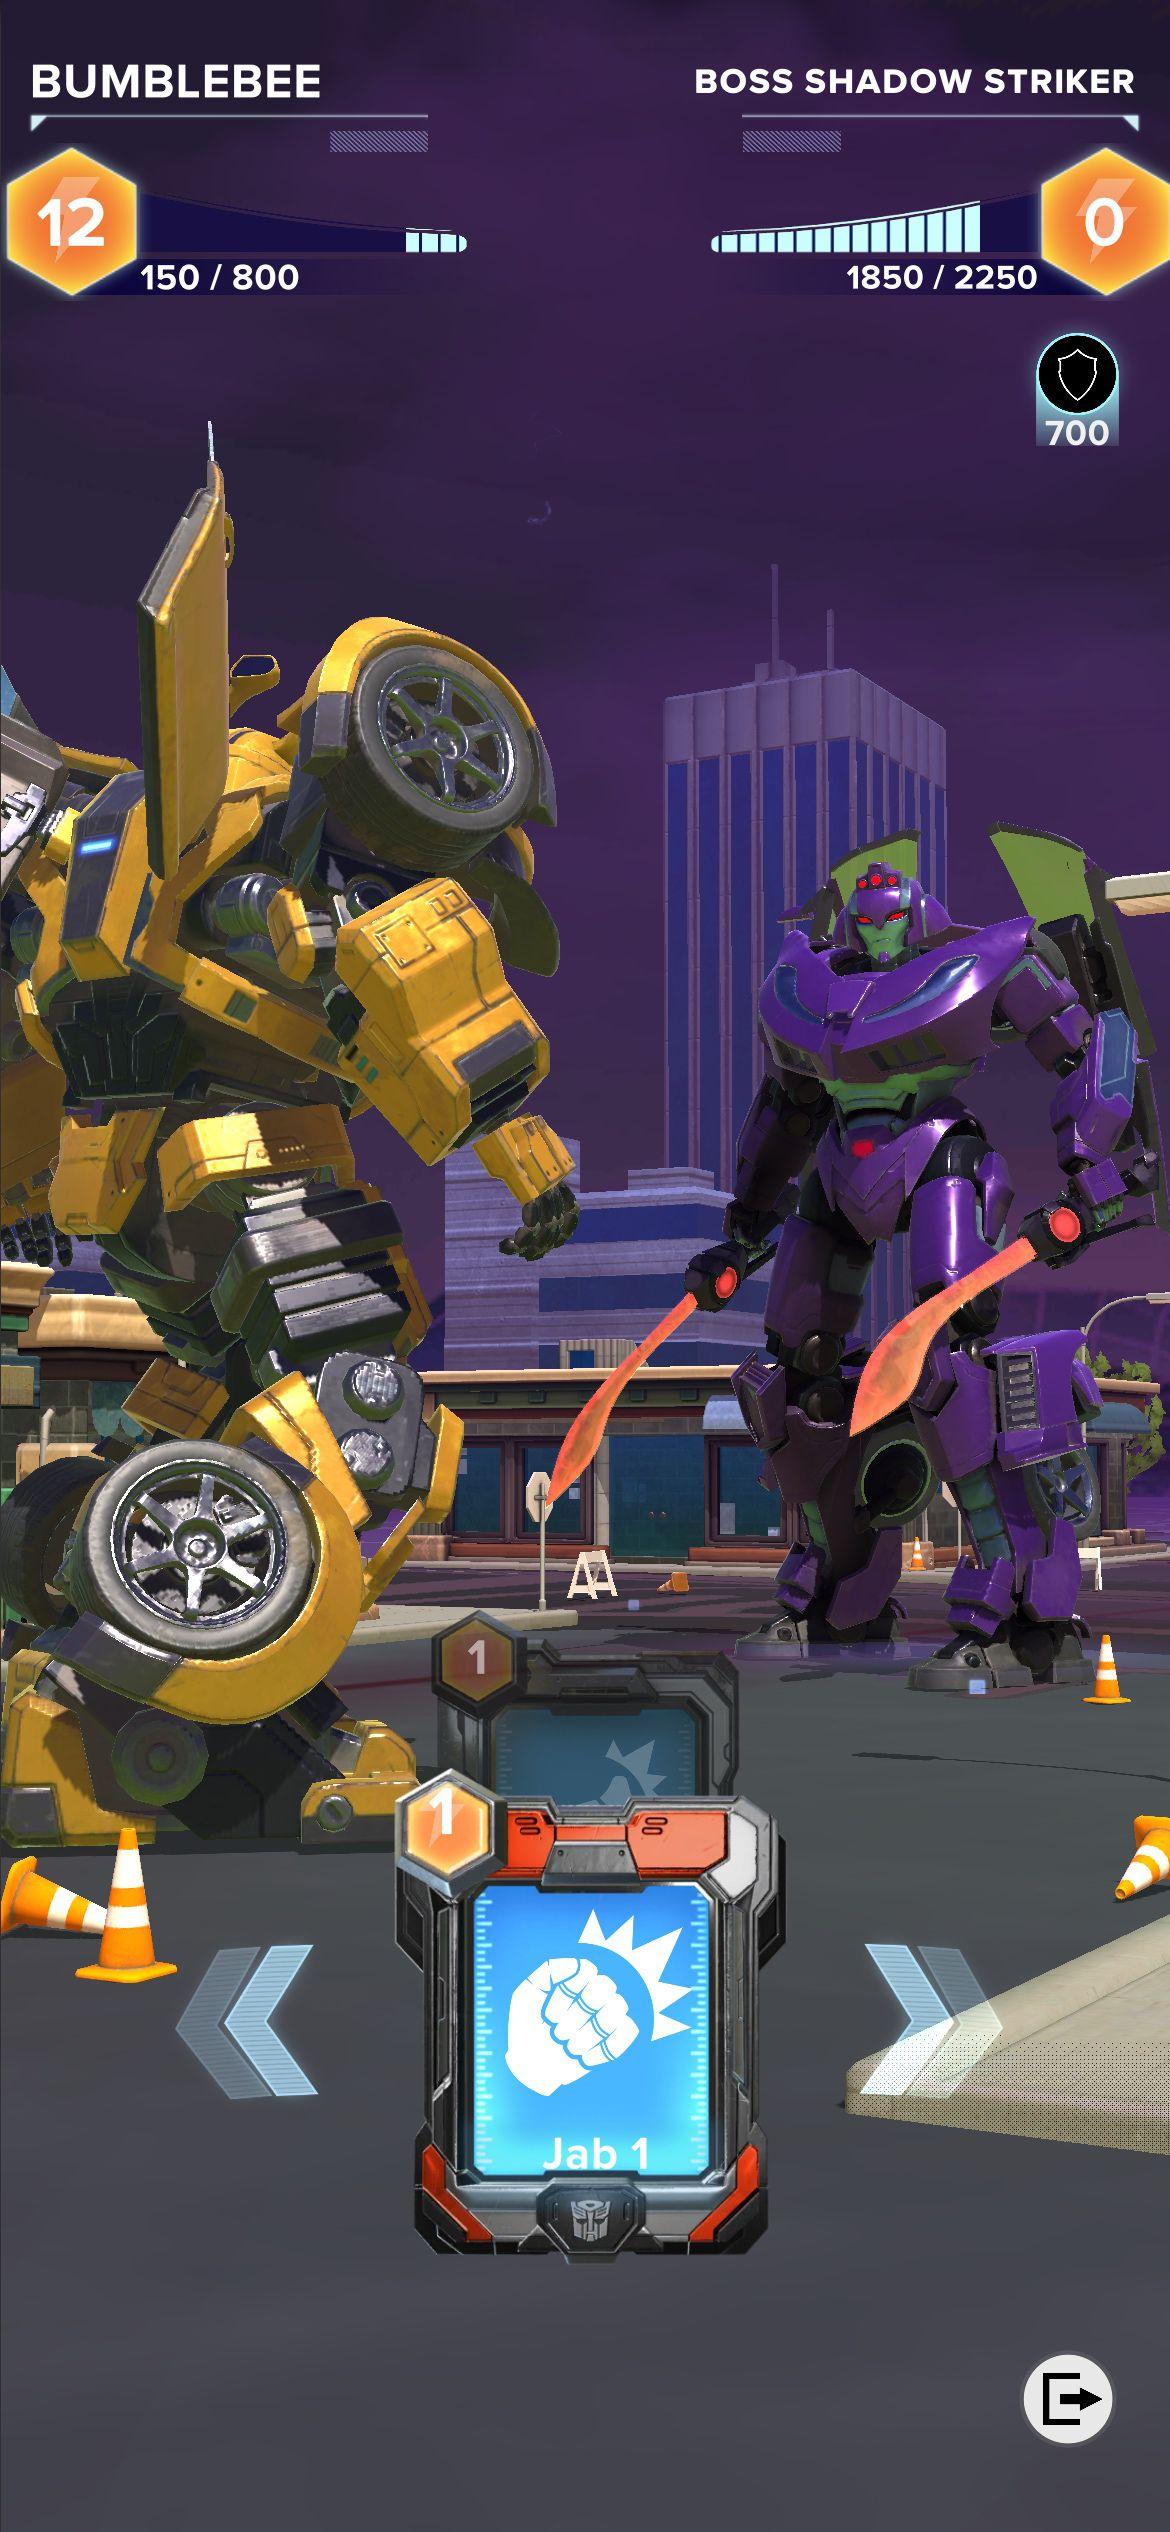 Bumblebee battles a Decepticon in Transformers: Heavy Metal